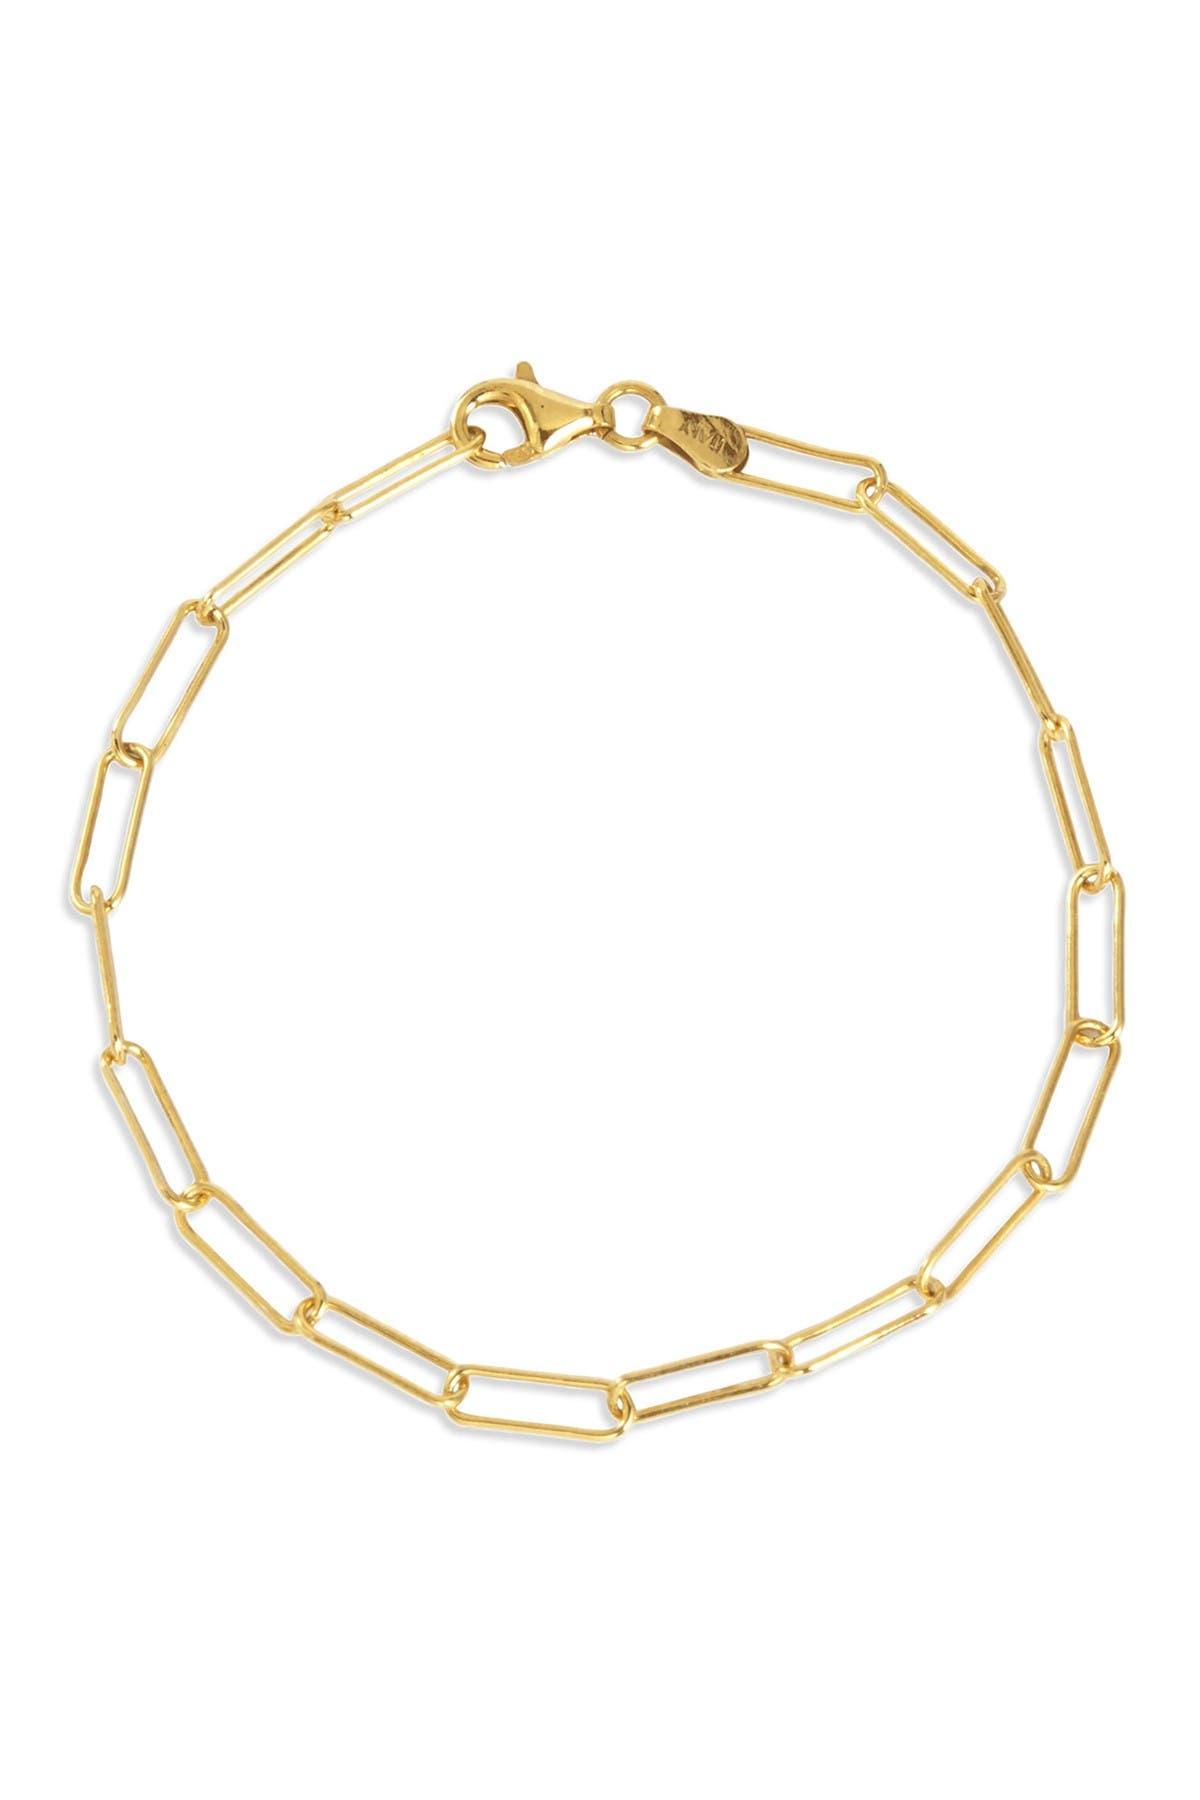 Image of Savvy Cie 18K Italian Yellow Gold Vermeil Chain Link Bracelet